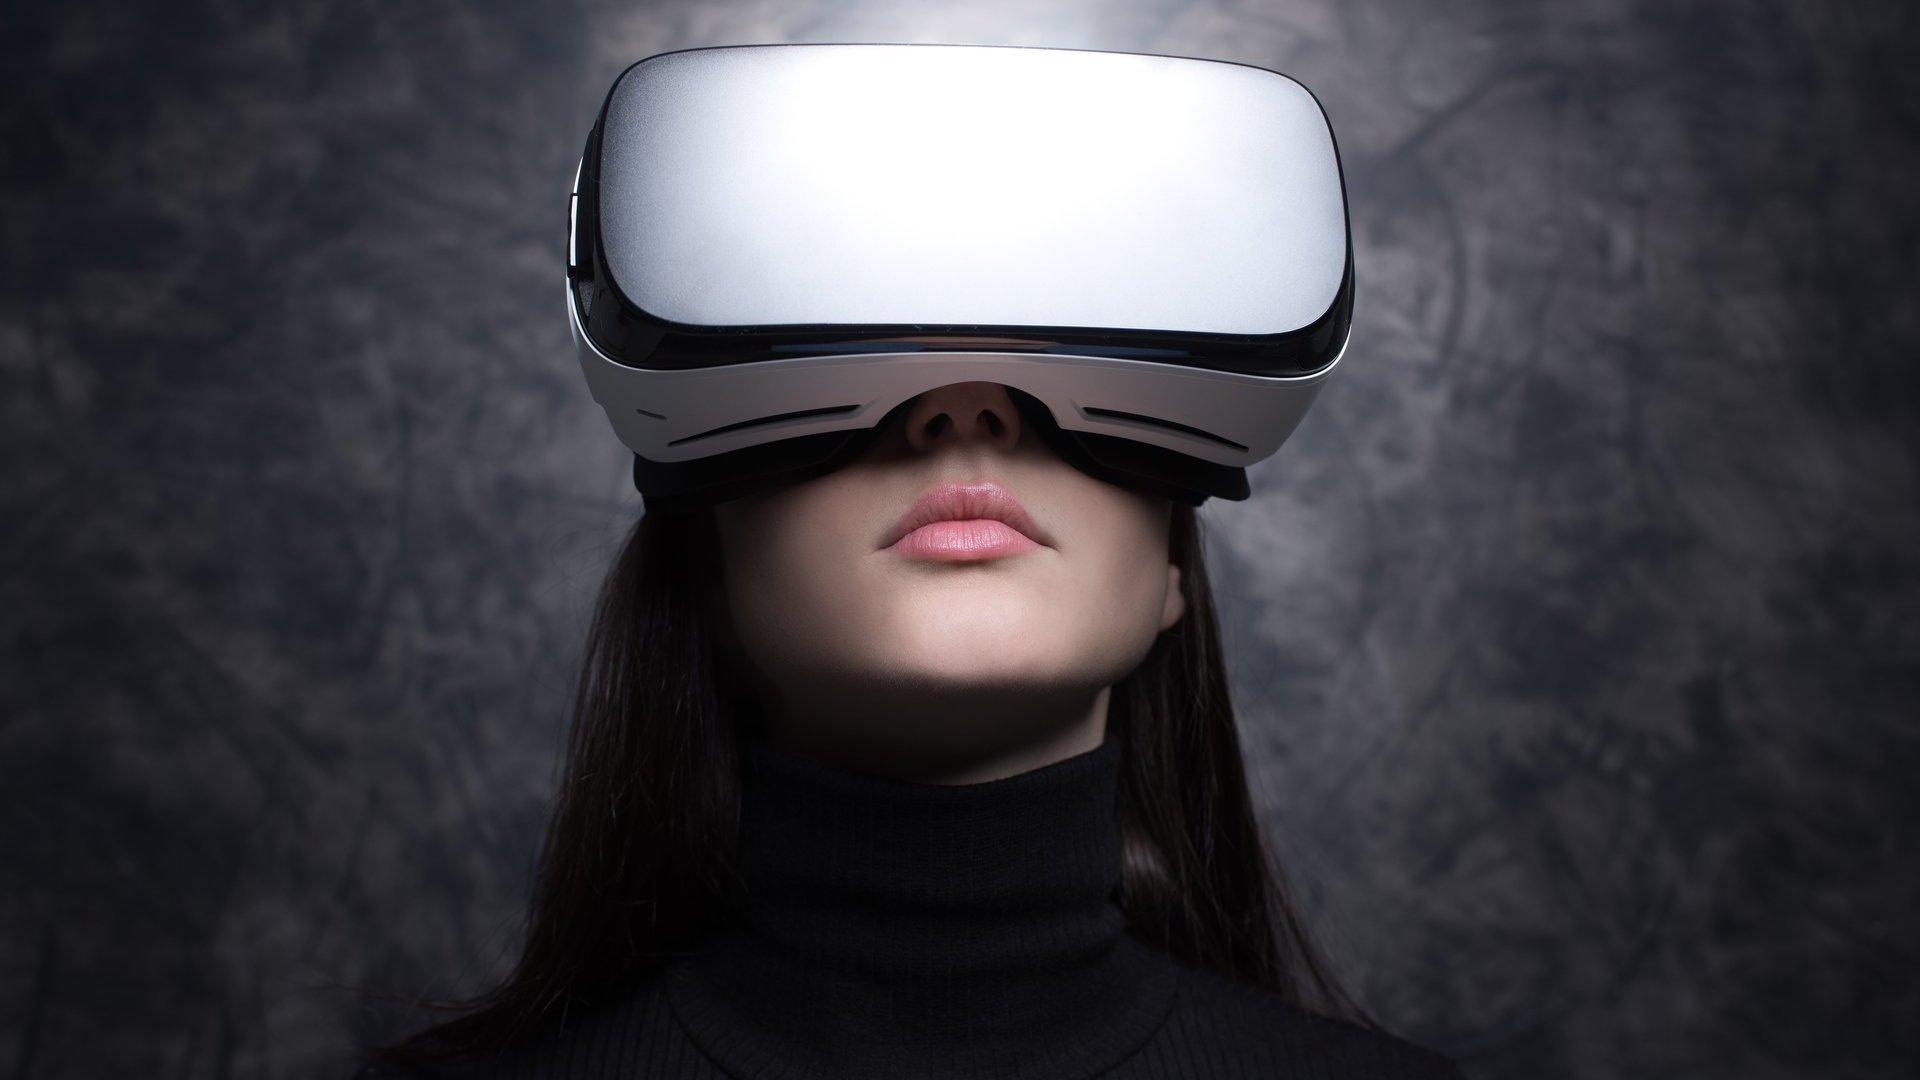 Tecnologia e futuro